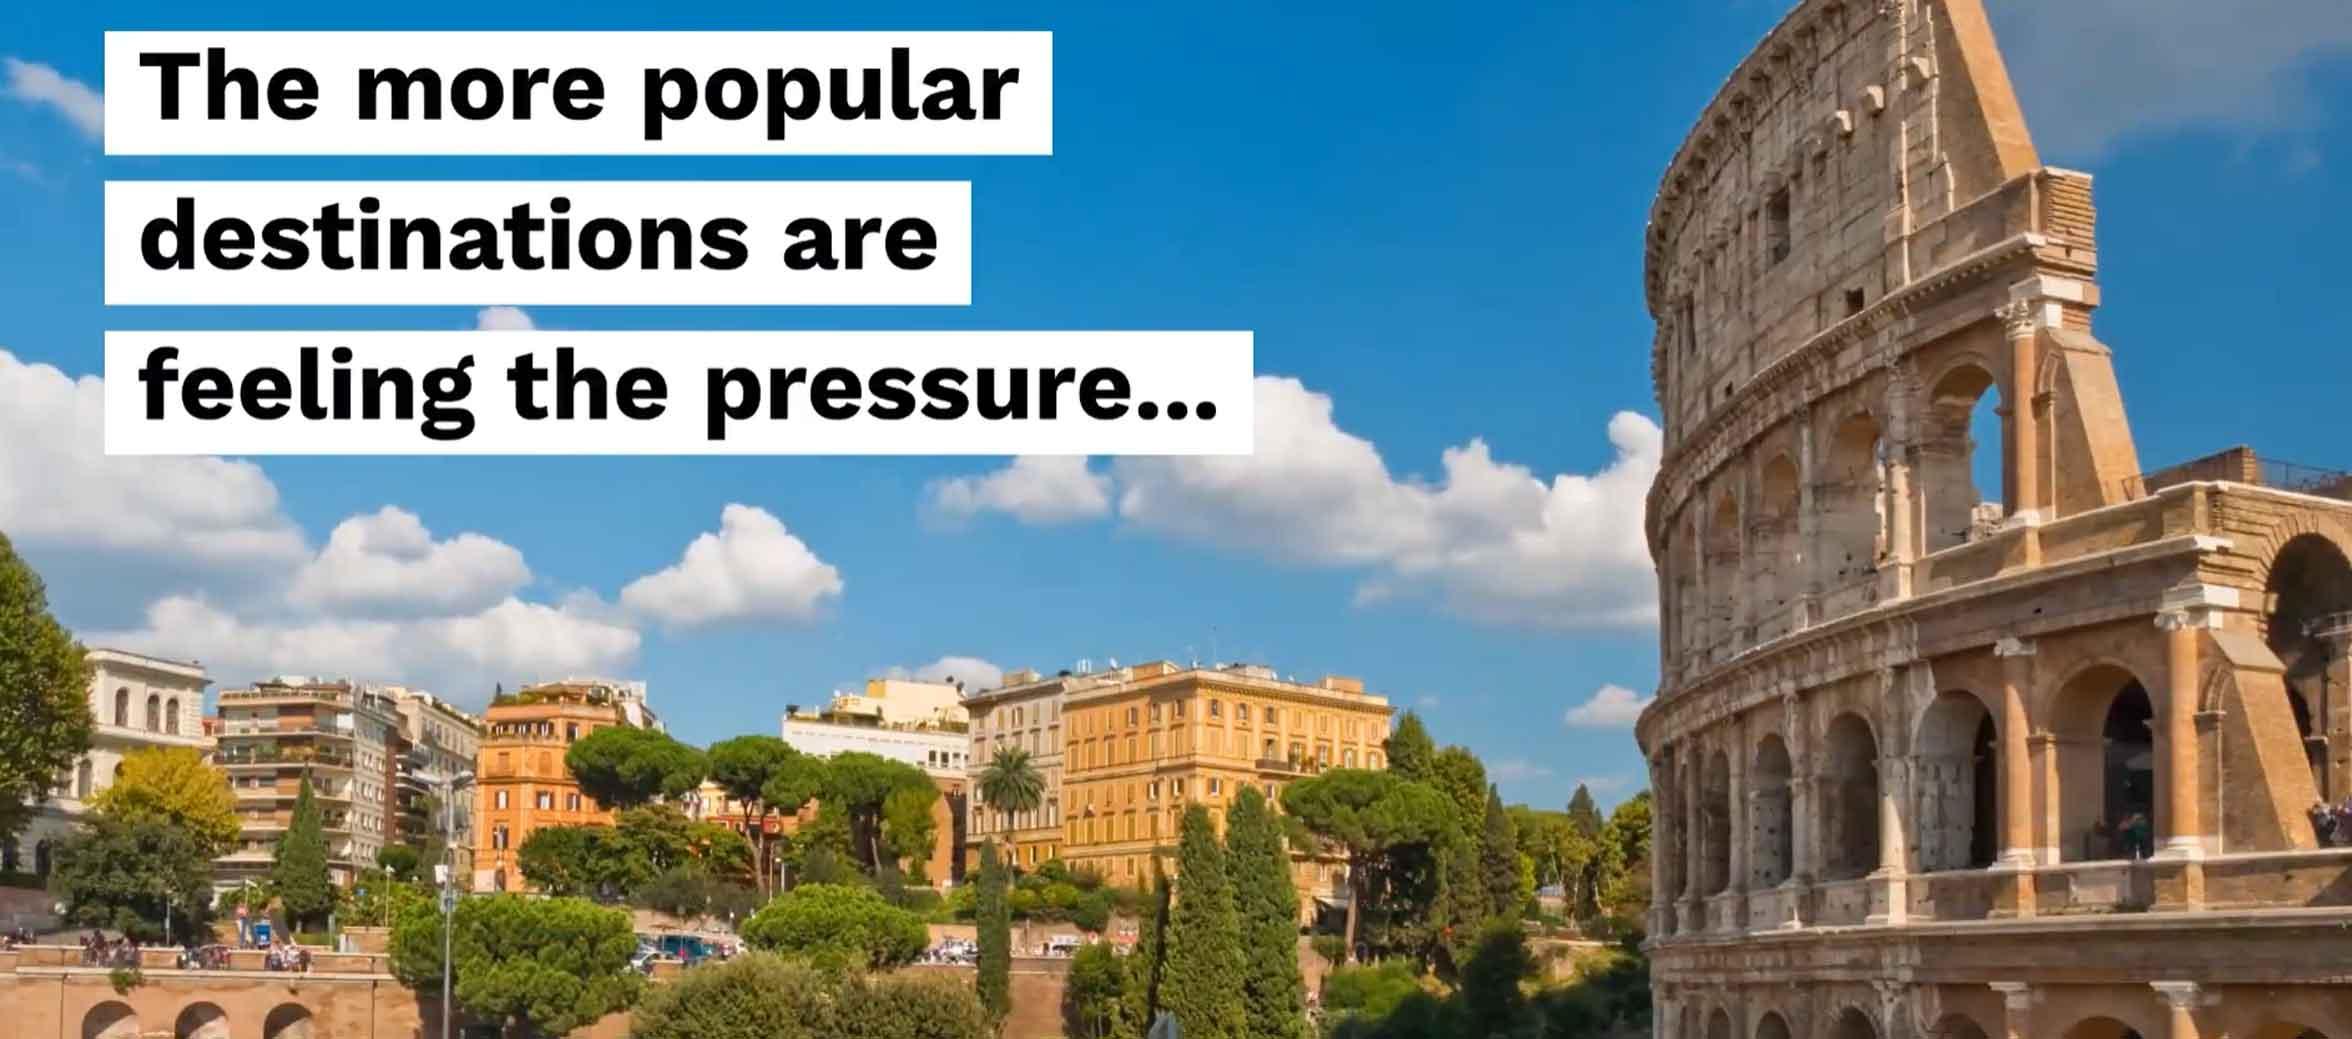 overtourism (image)